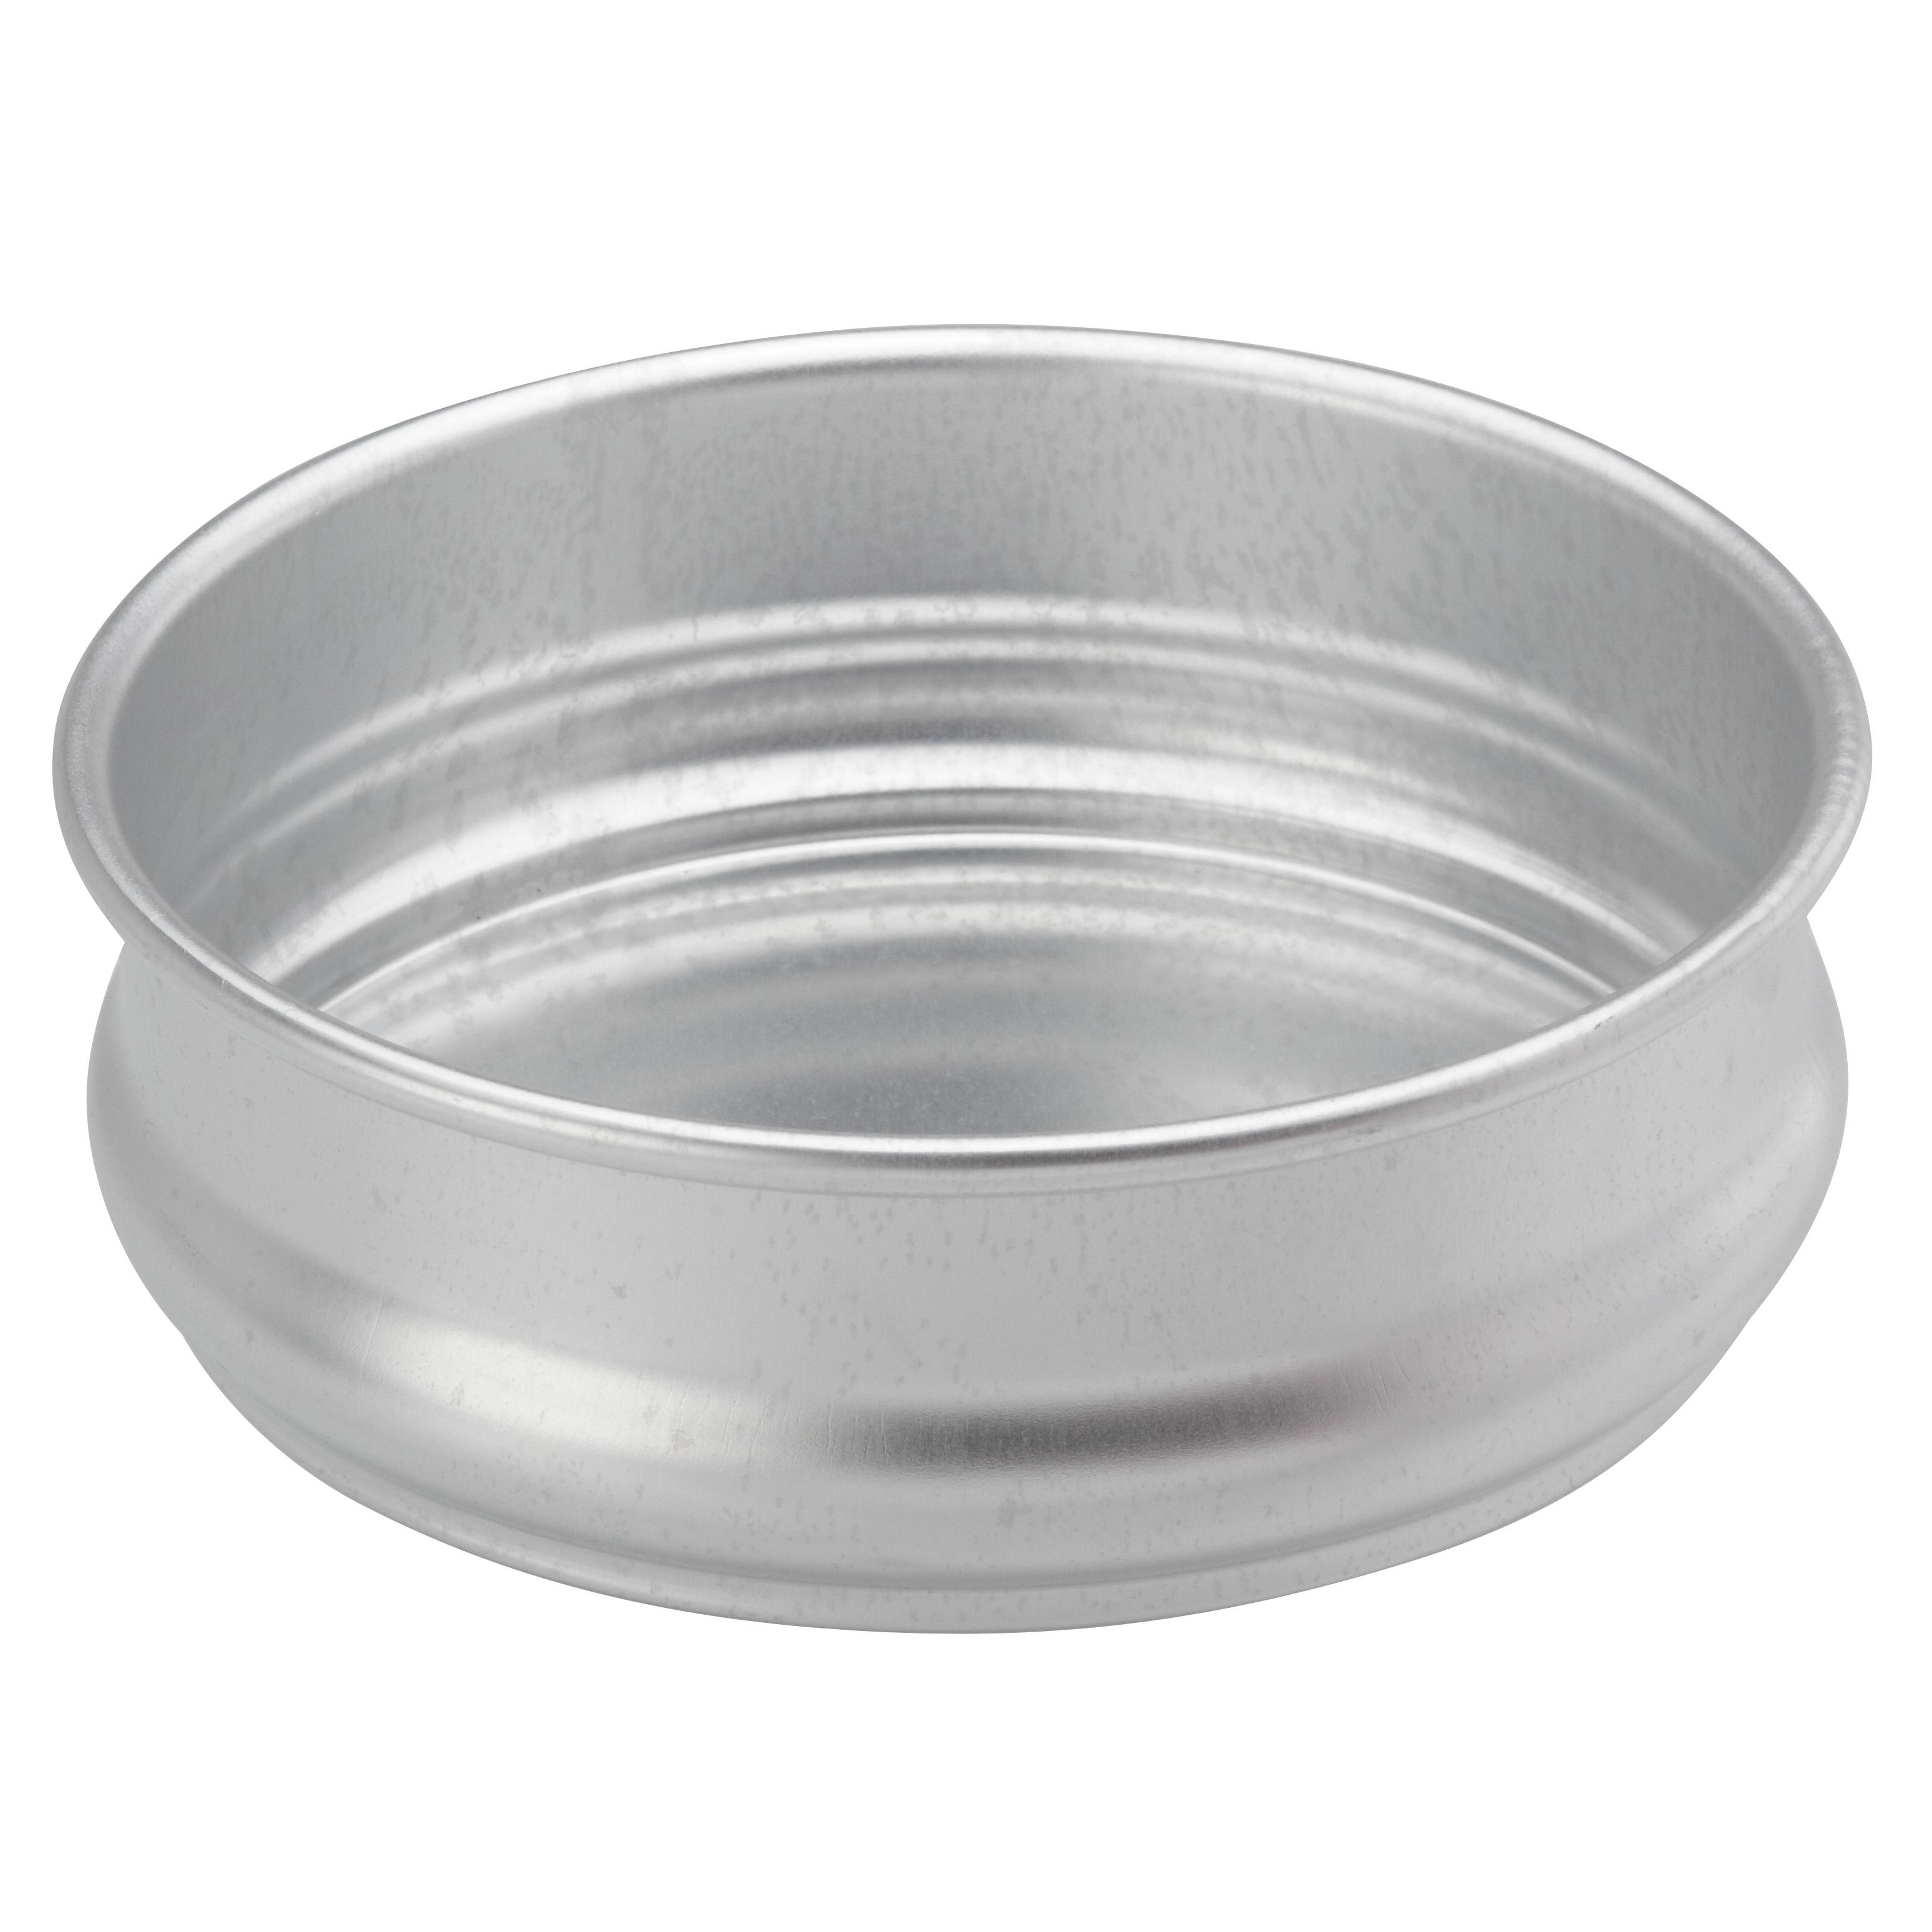 Royal Industries ROY ALDP 48 dough rising/banneton basket